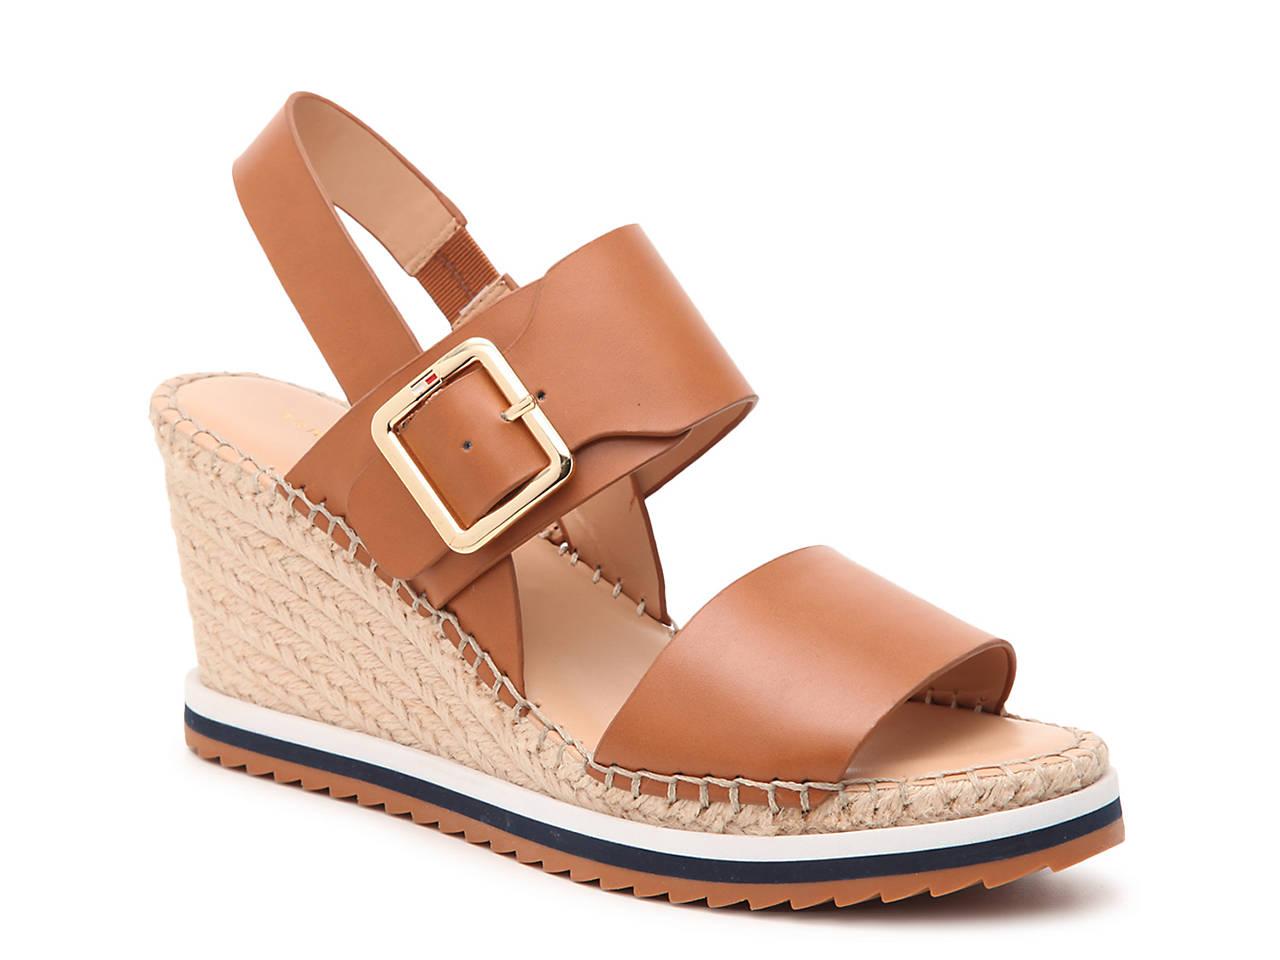 cc056ab755c Yazzi Espadrille Wedge Sandal